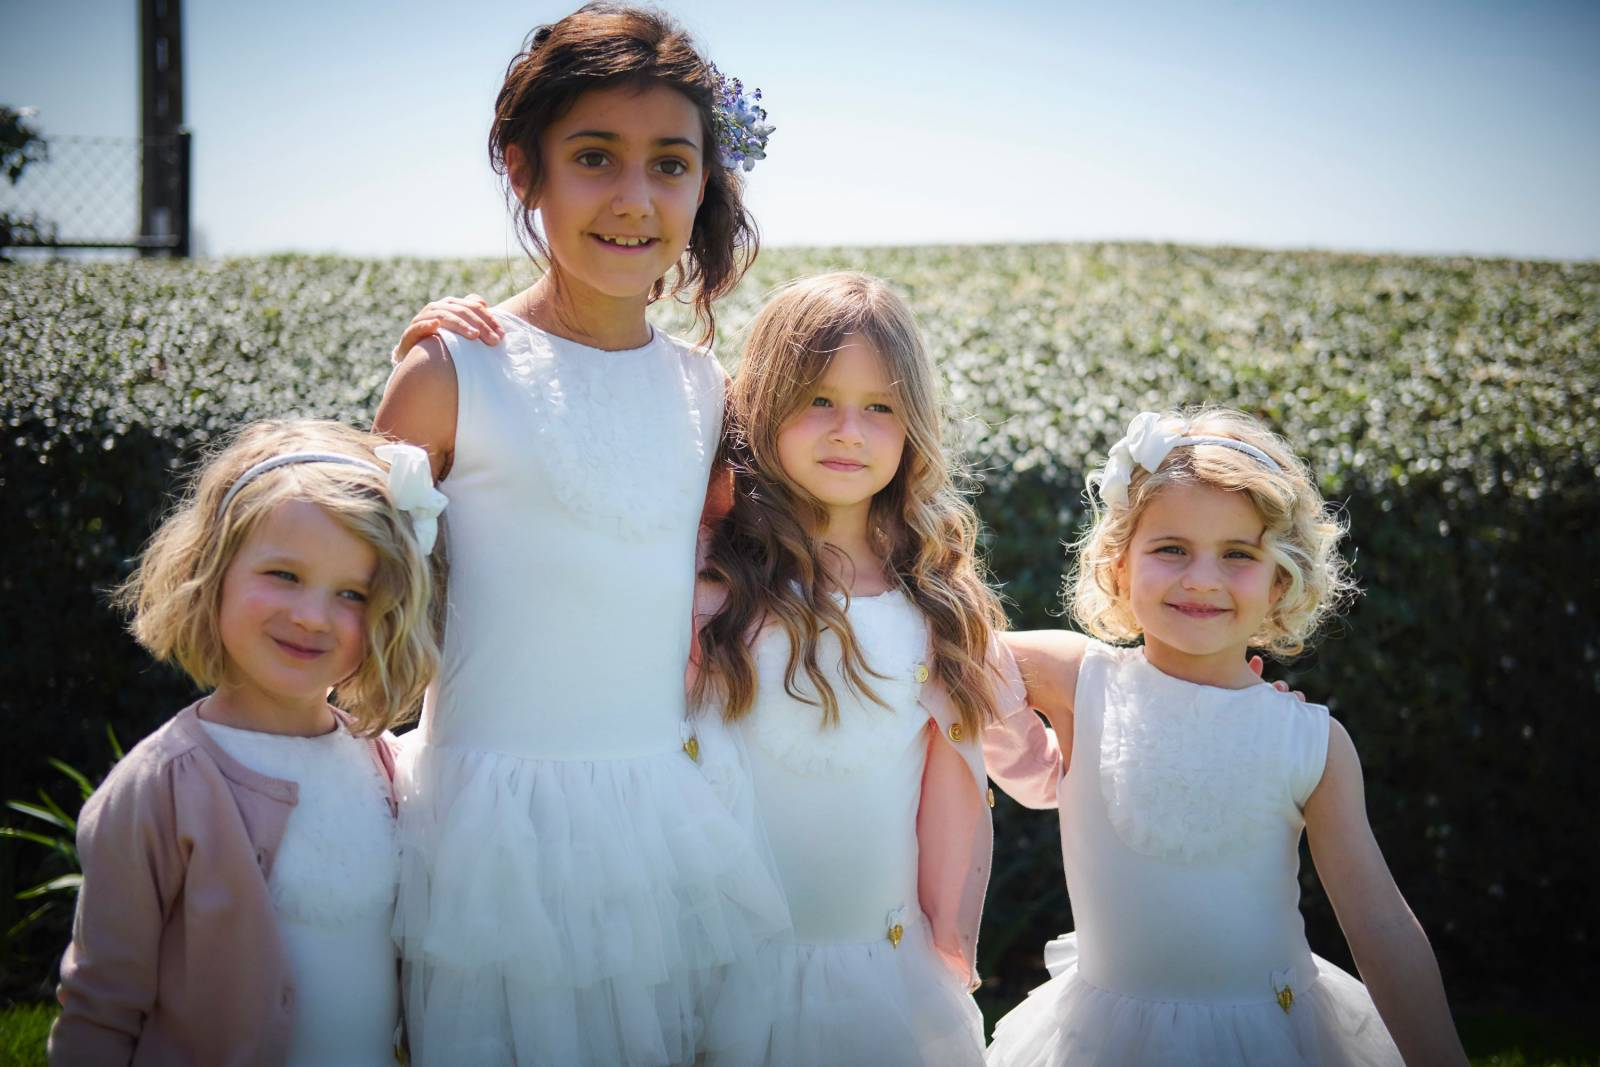 Comme Je Suis - Af fotografie - Annick Van Wesemael - House of Weddings  - 17